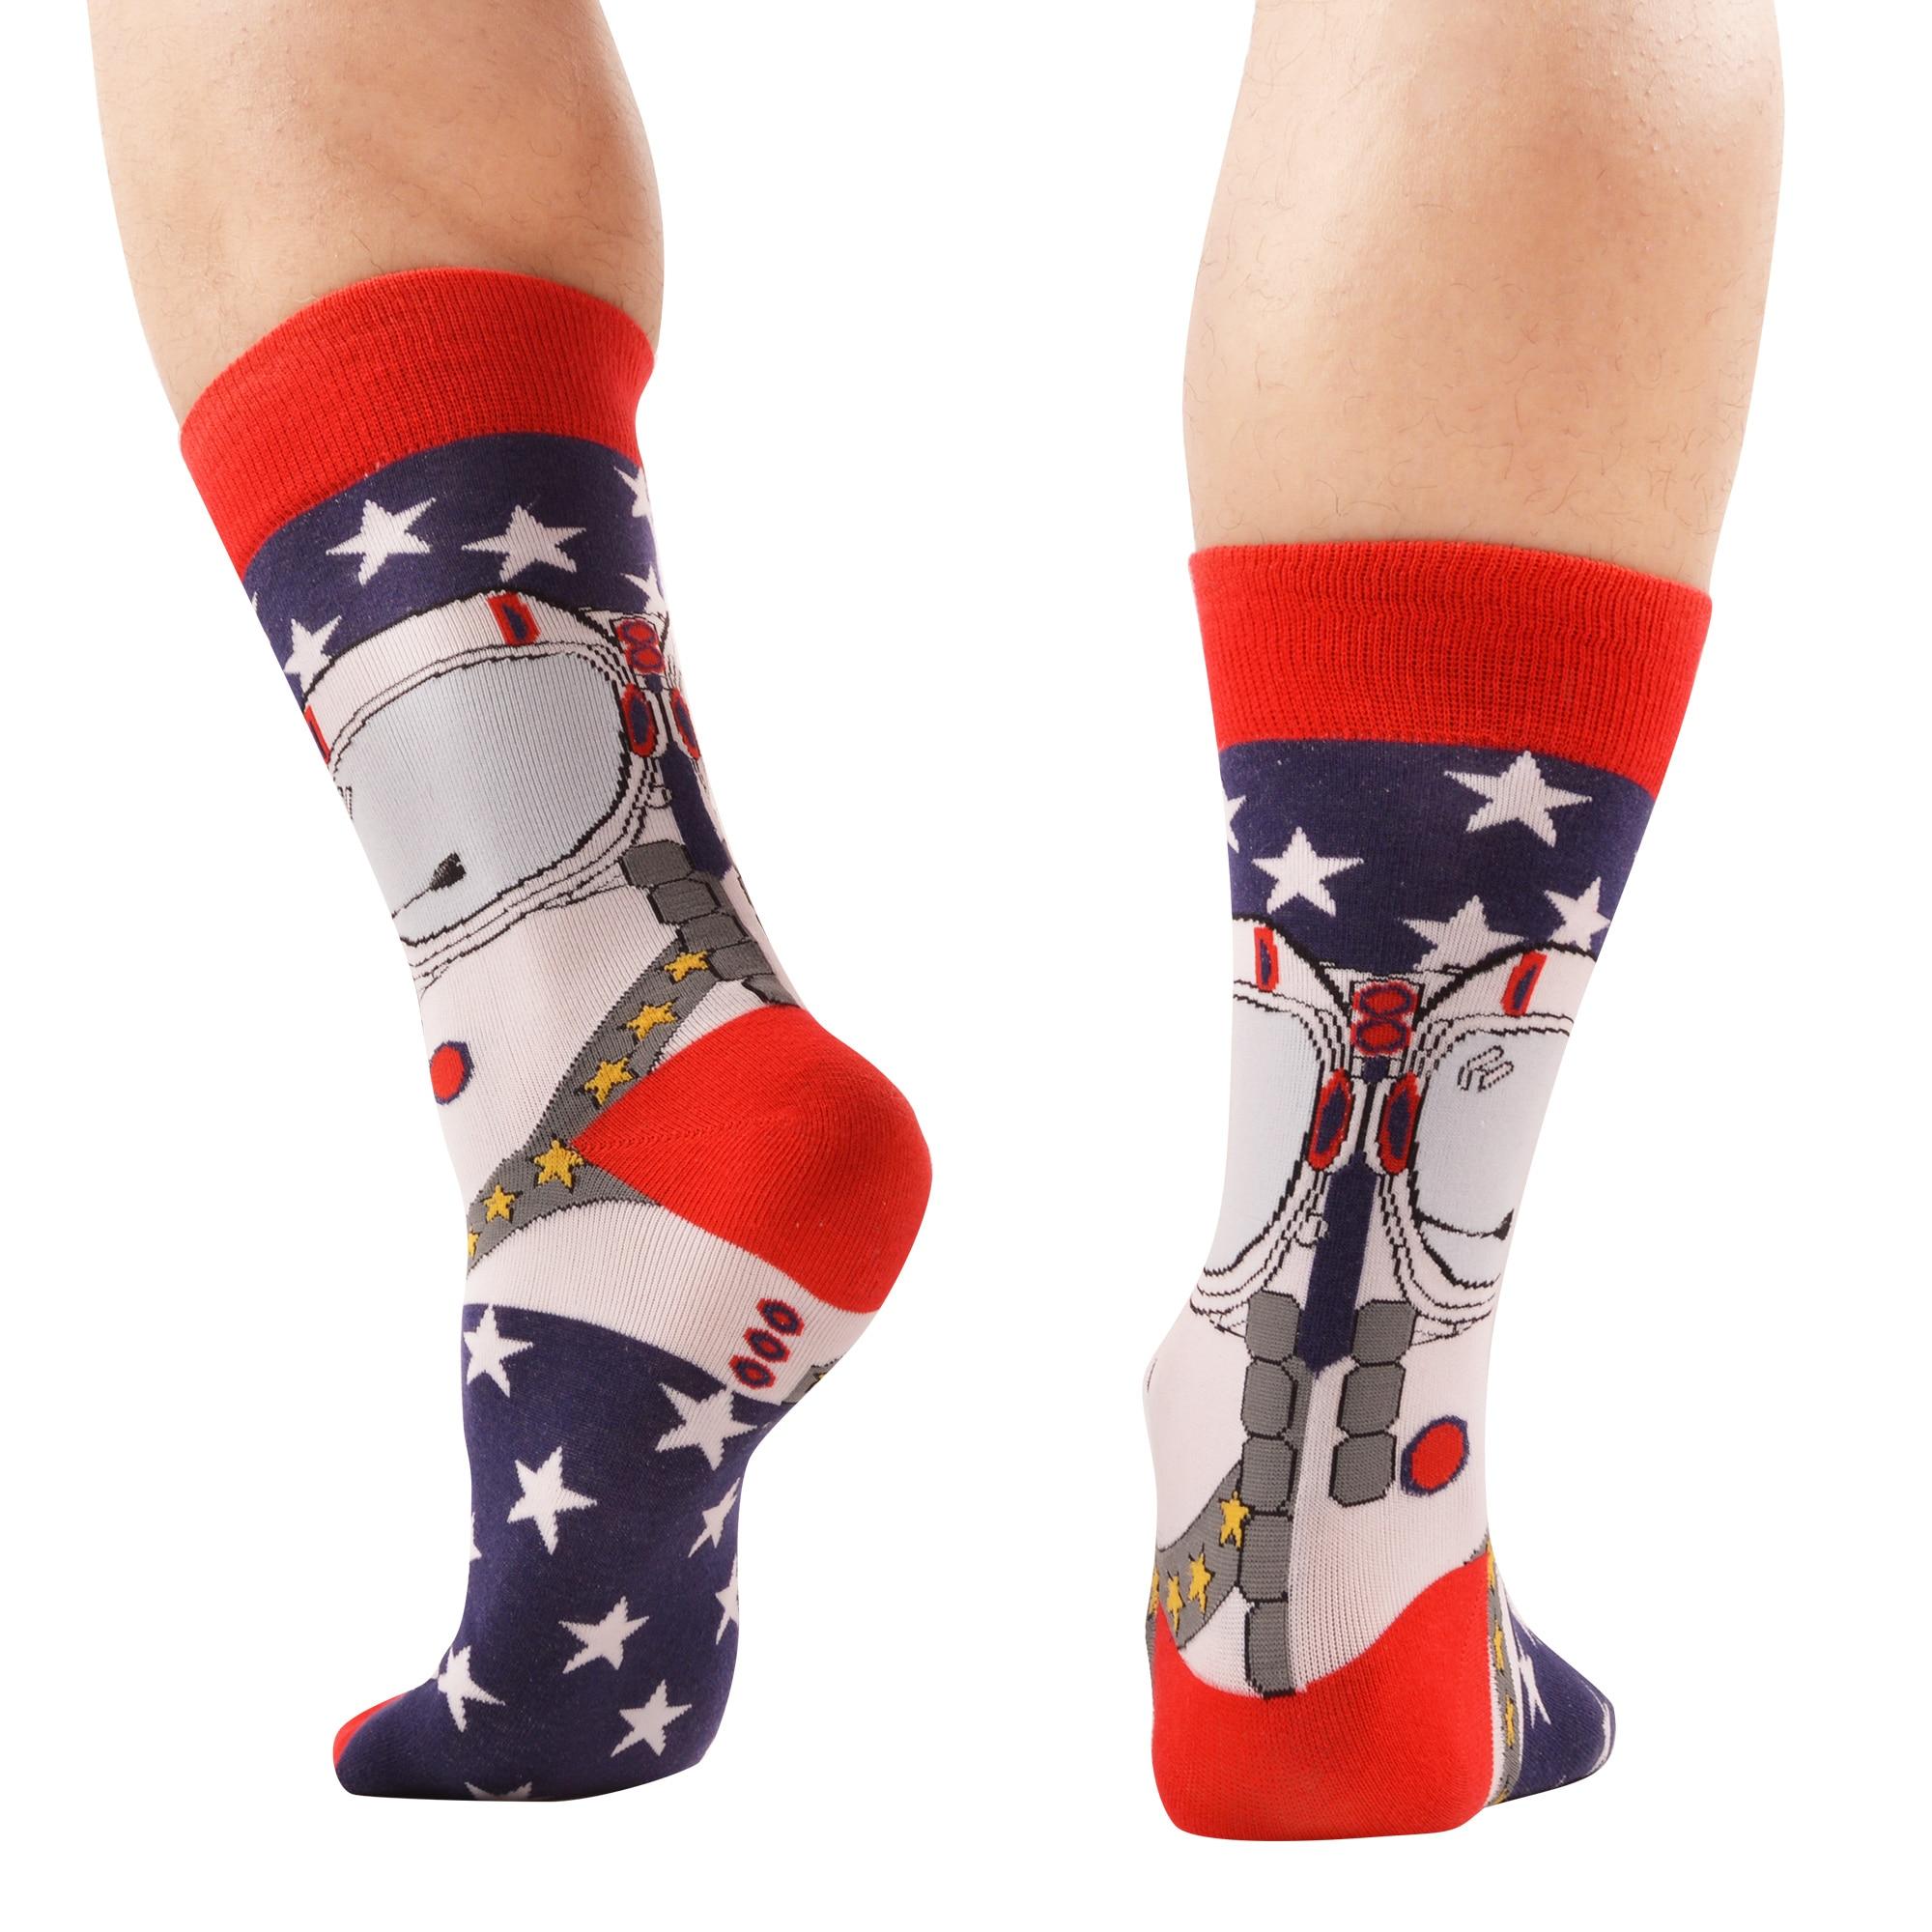 SANZETTI Brand 2019 New Happy Men Socks Bright Colorful Space Animal Novelty Pattern Causal Dress Socks Funny Gift Wedding Socks